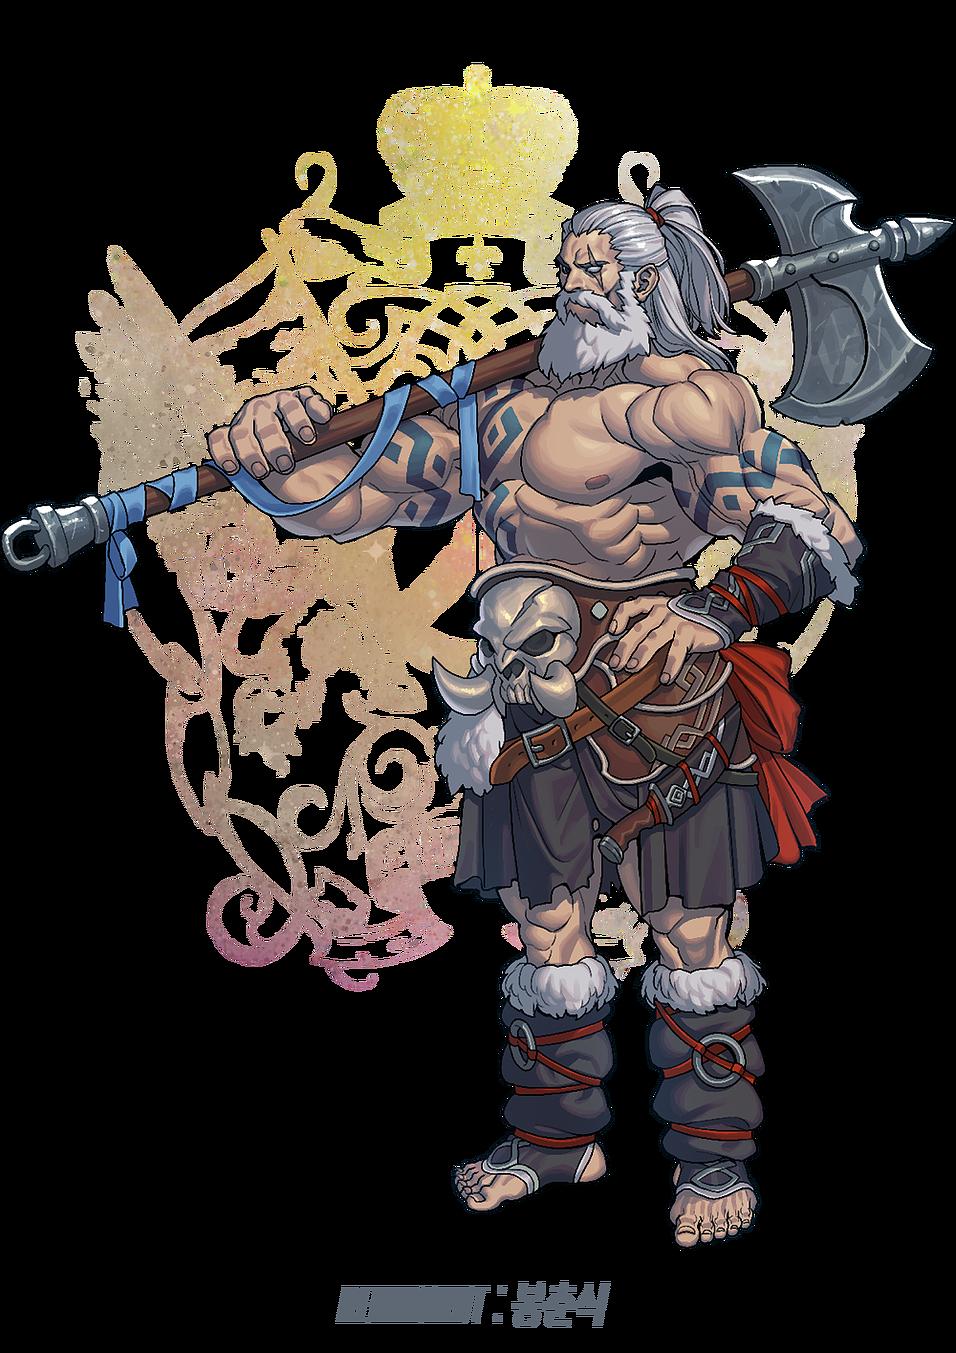 Fantasia character design pinterest. Overwatch reinhardt png